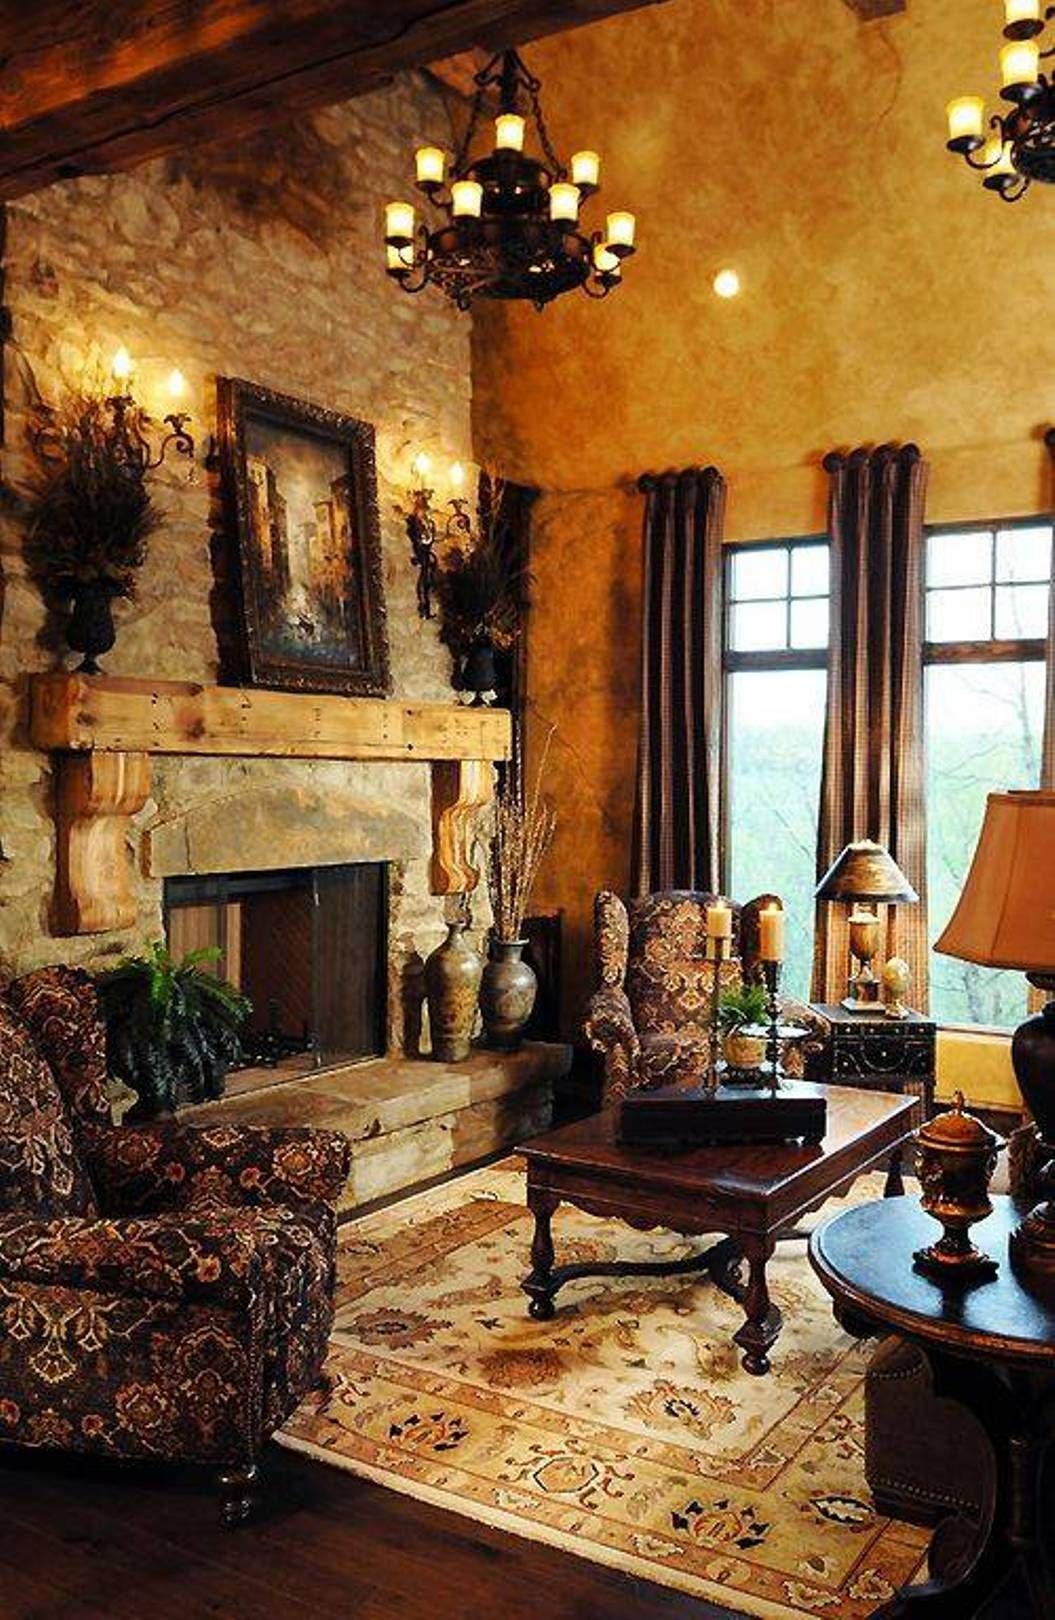 Old World Splendor Meets Modern Luxury; I Love The Rich Fabric U0026 Wood Decor  In This Living Room (faux Finish U0026 Rock)